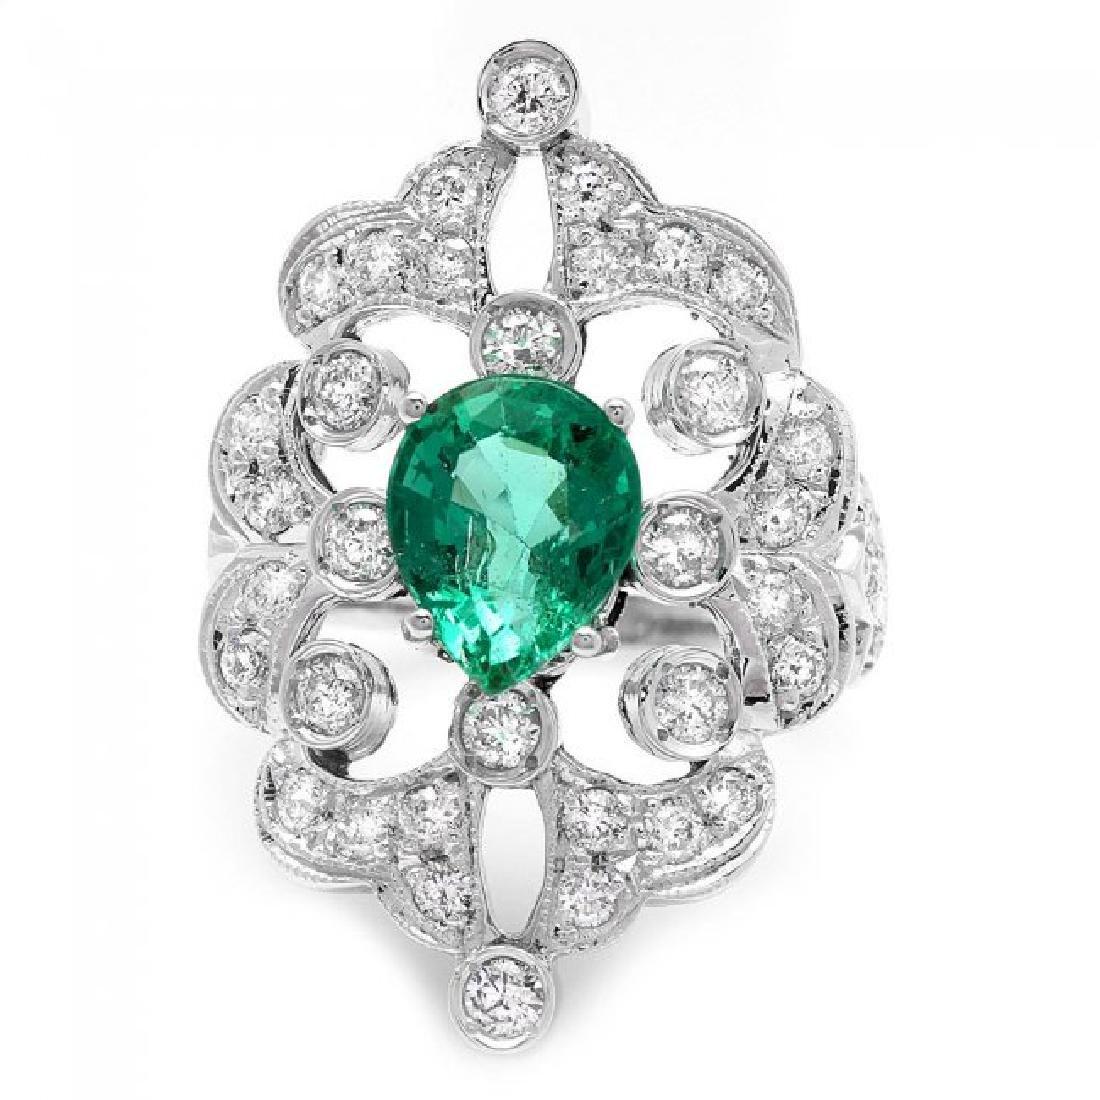 14k White Gold 2.00ct Emerald 1.35ct Diamond Ring - 2